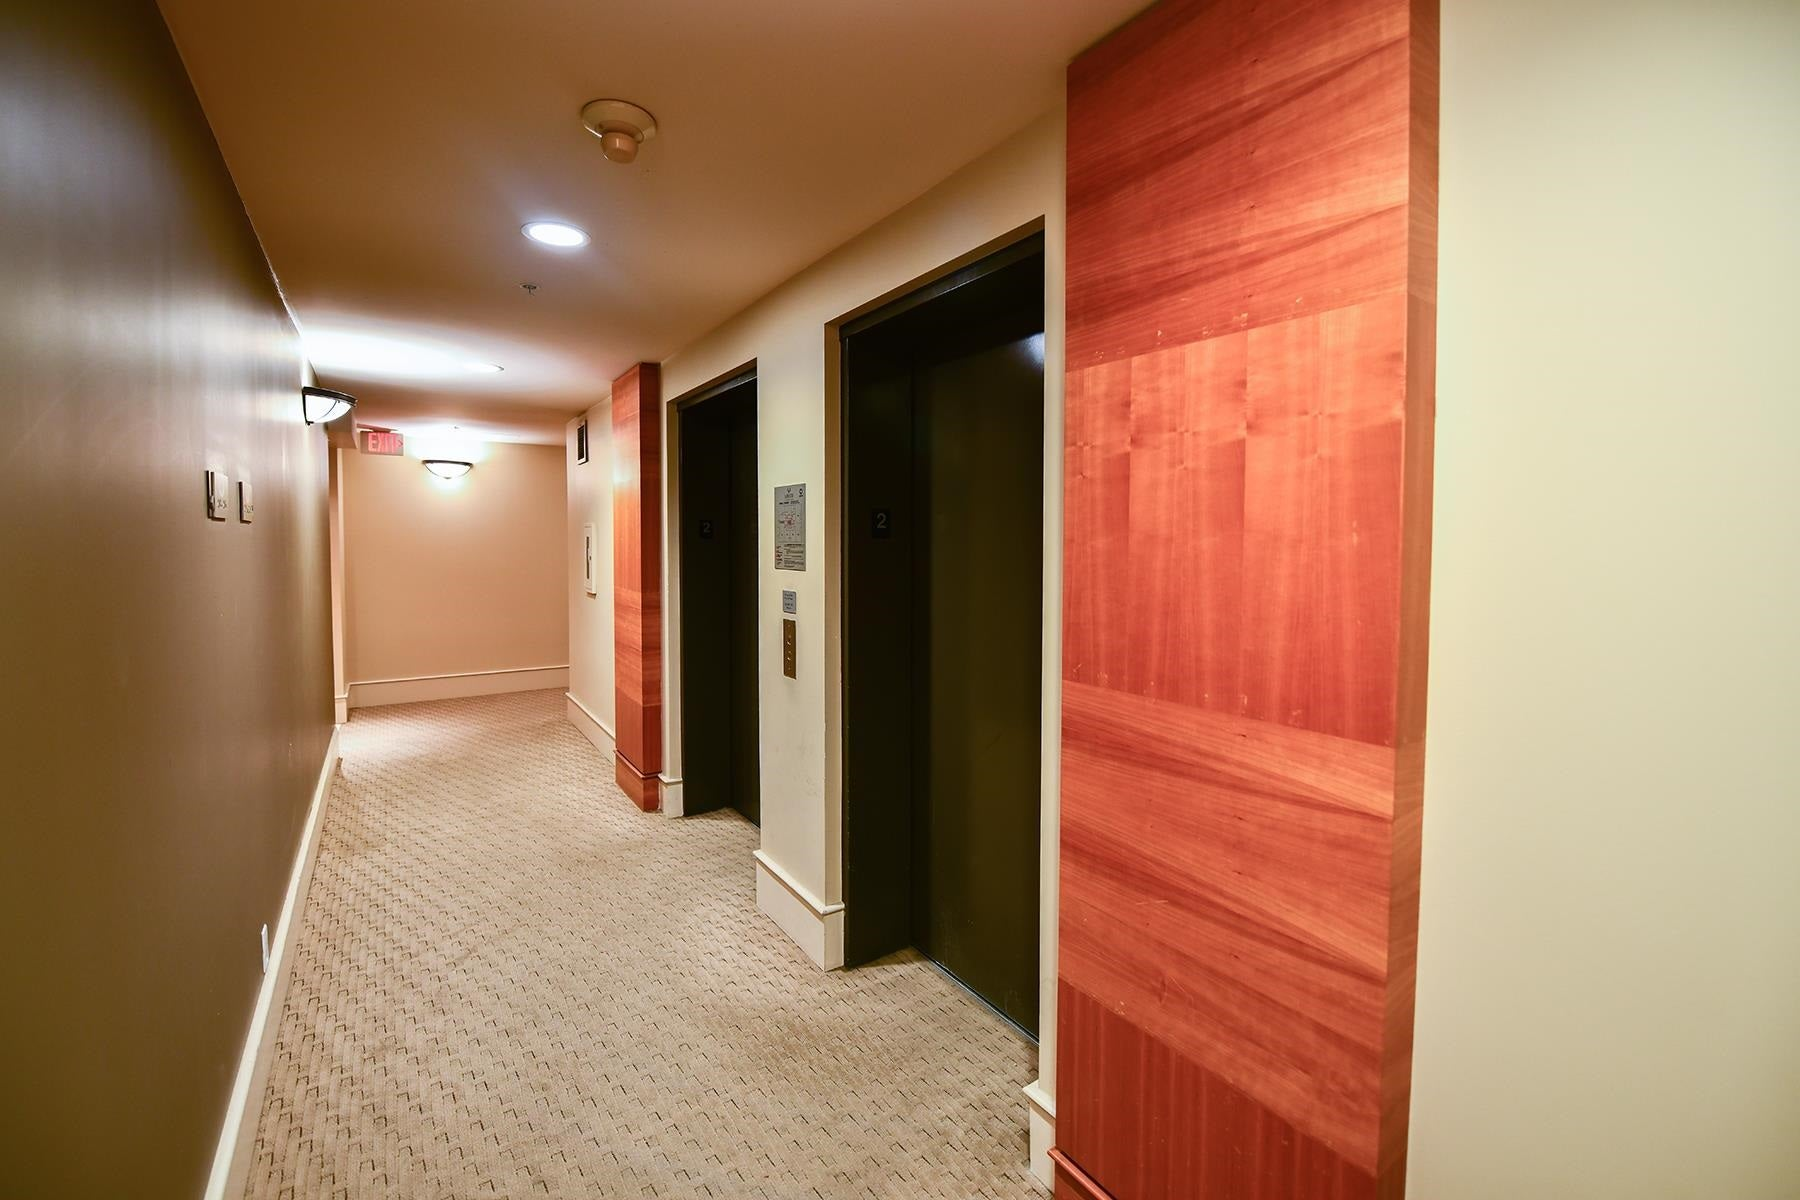 204 5790 EAST BOULEVARD - Kerrisdale Apartment/Condo for sale, 3 Bedrooms (R2604138) - #23